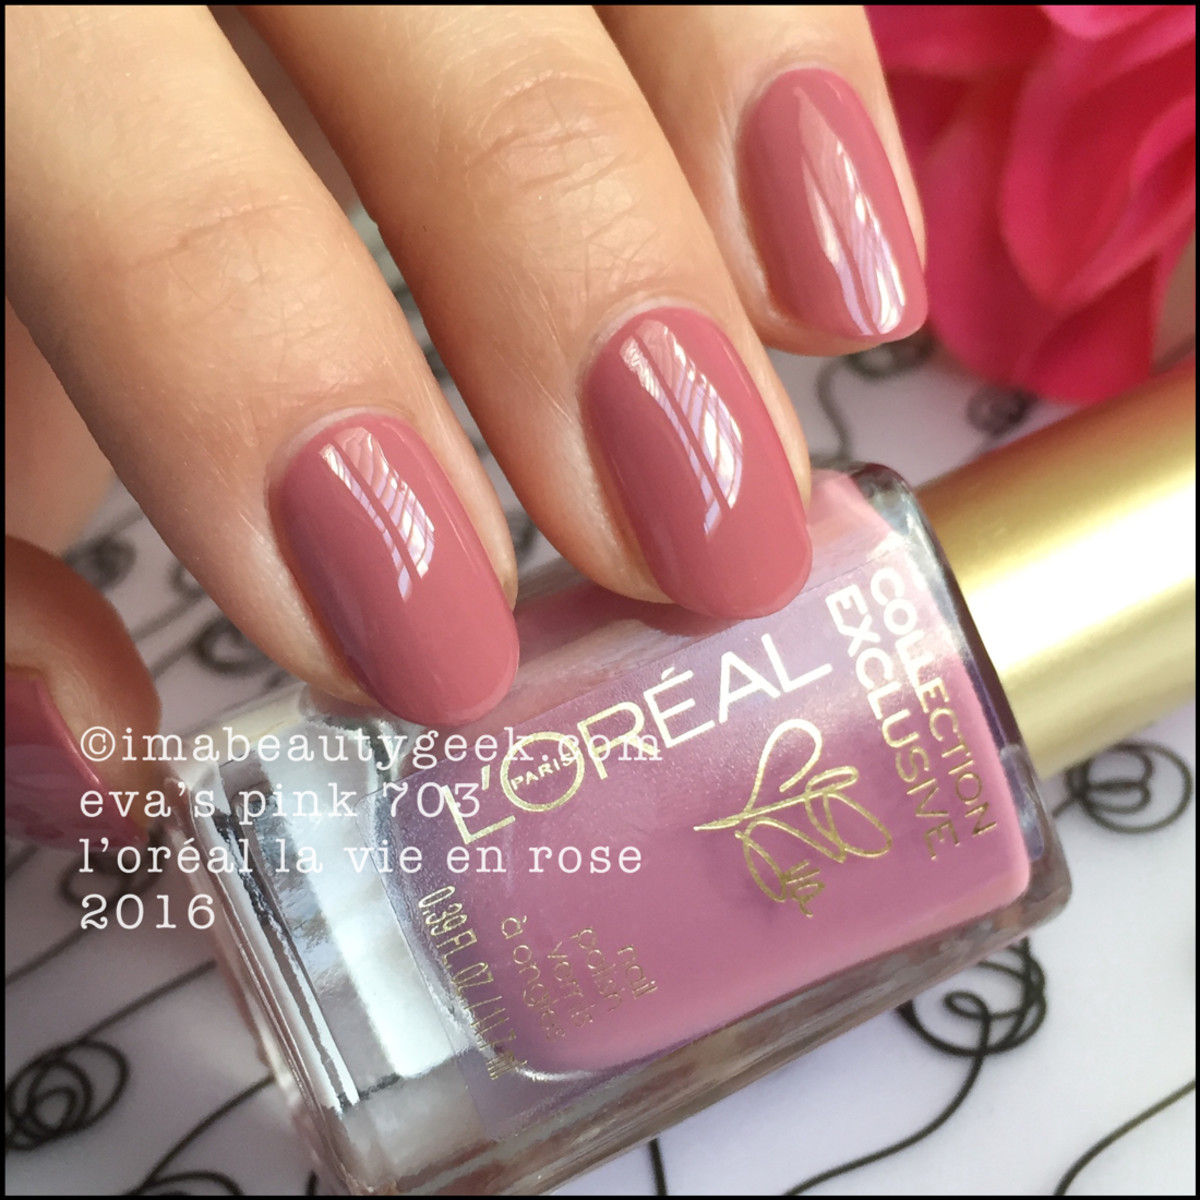 L\'OREAL PARIS LA VIE EN ROSE NAIL POLISH 2016 - Beautygeeks